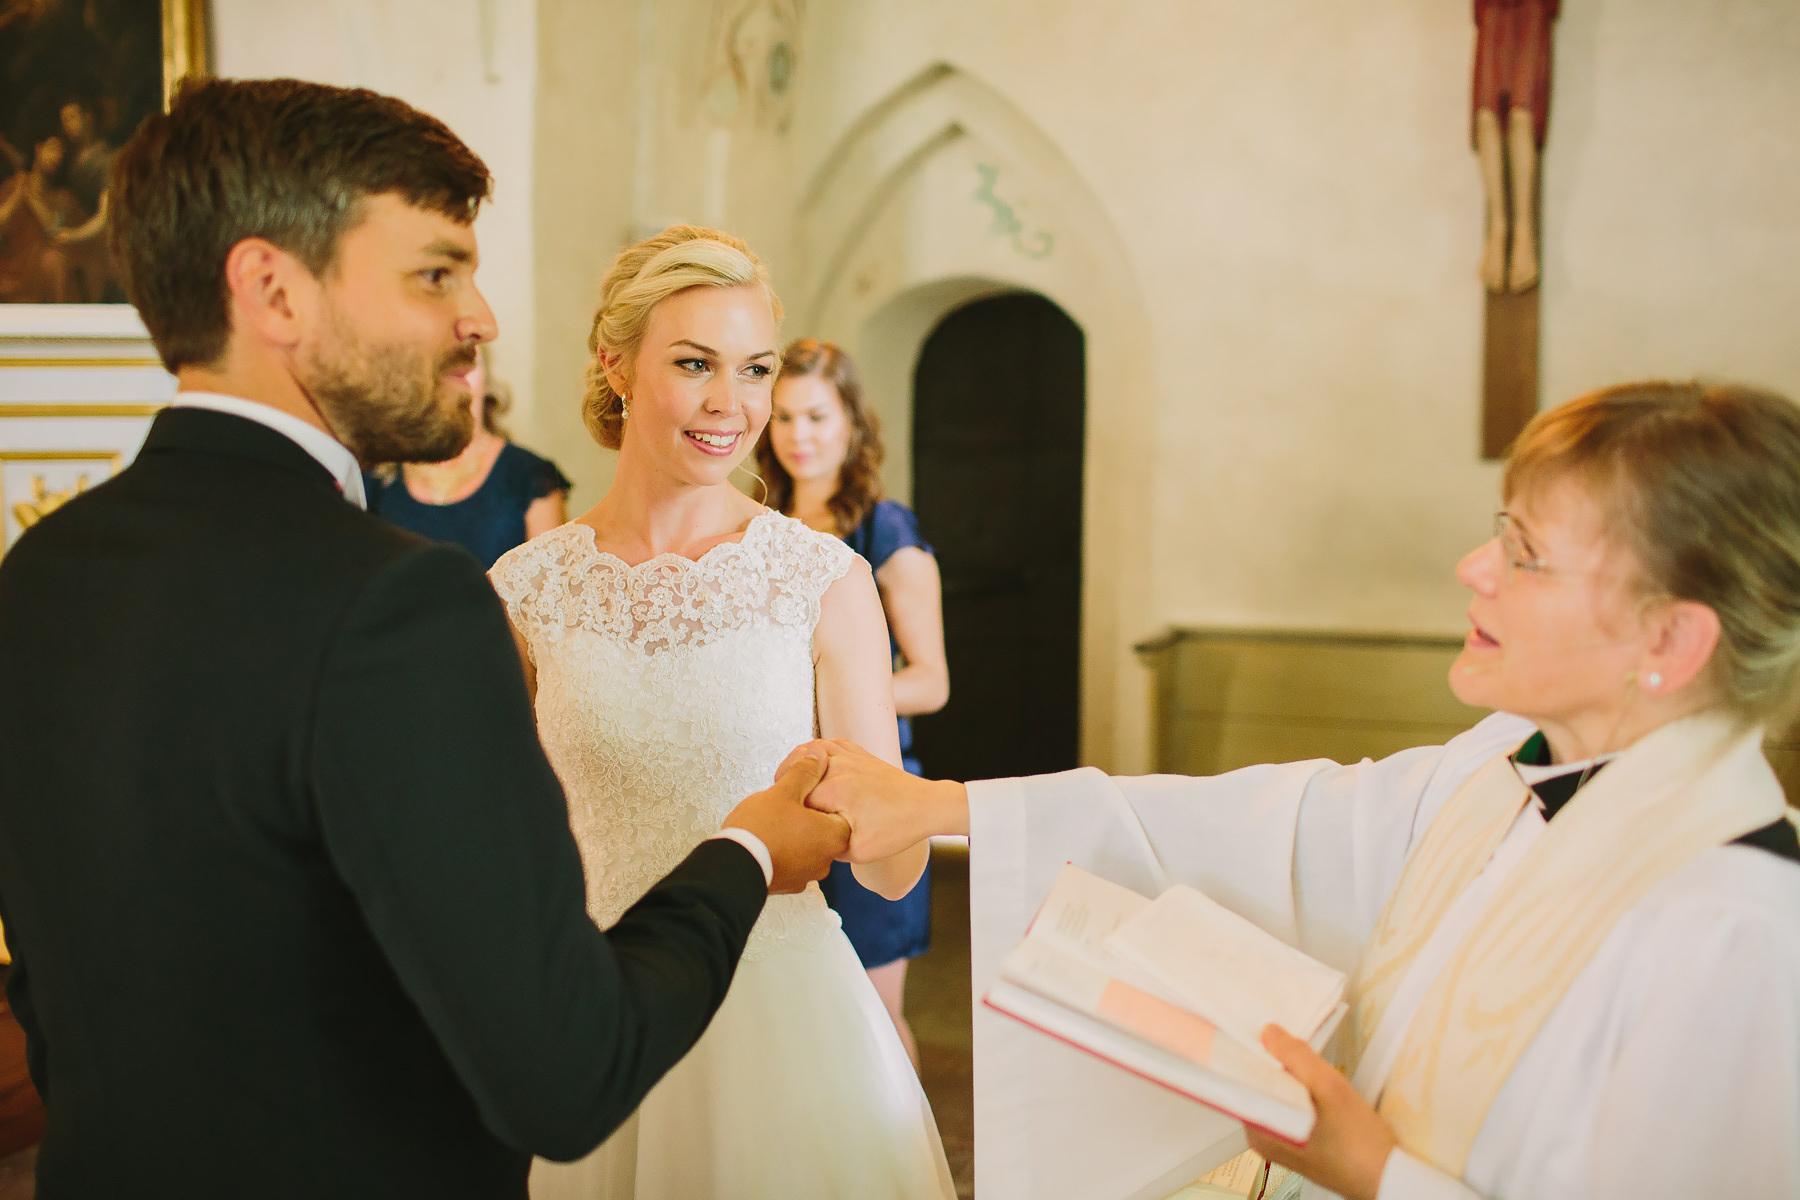 Välsignelse under bröllop